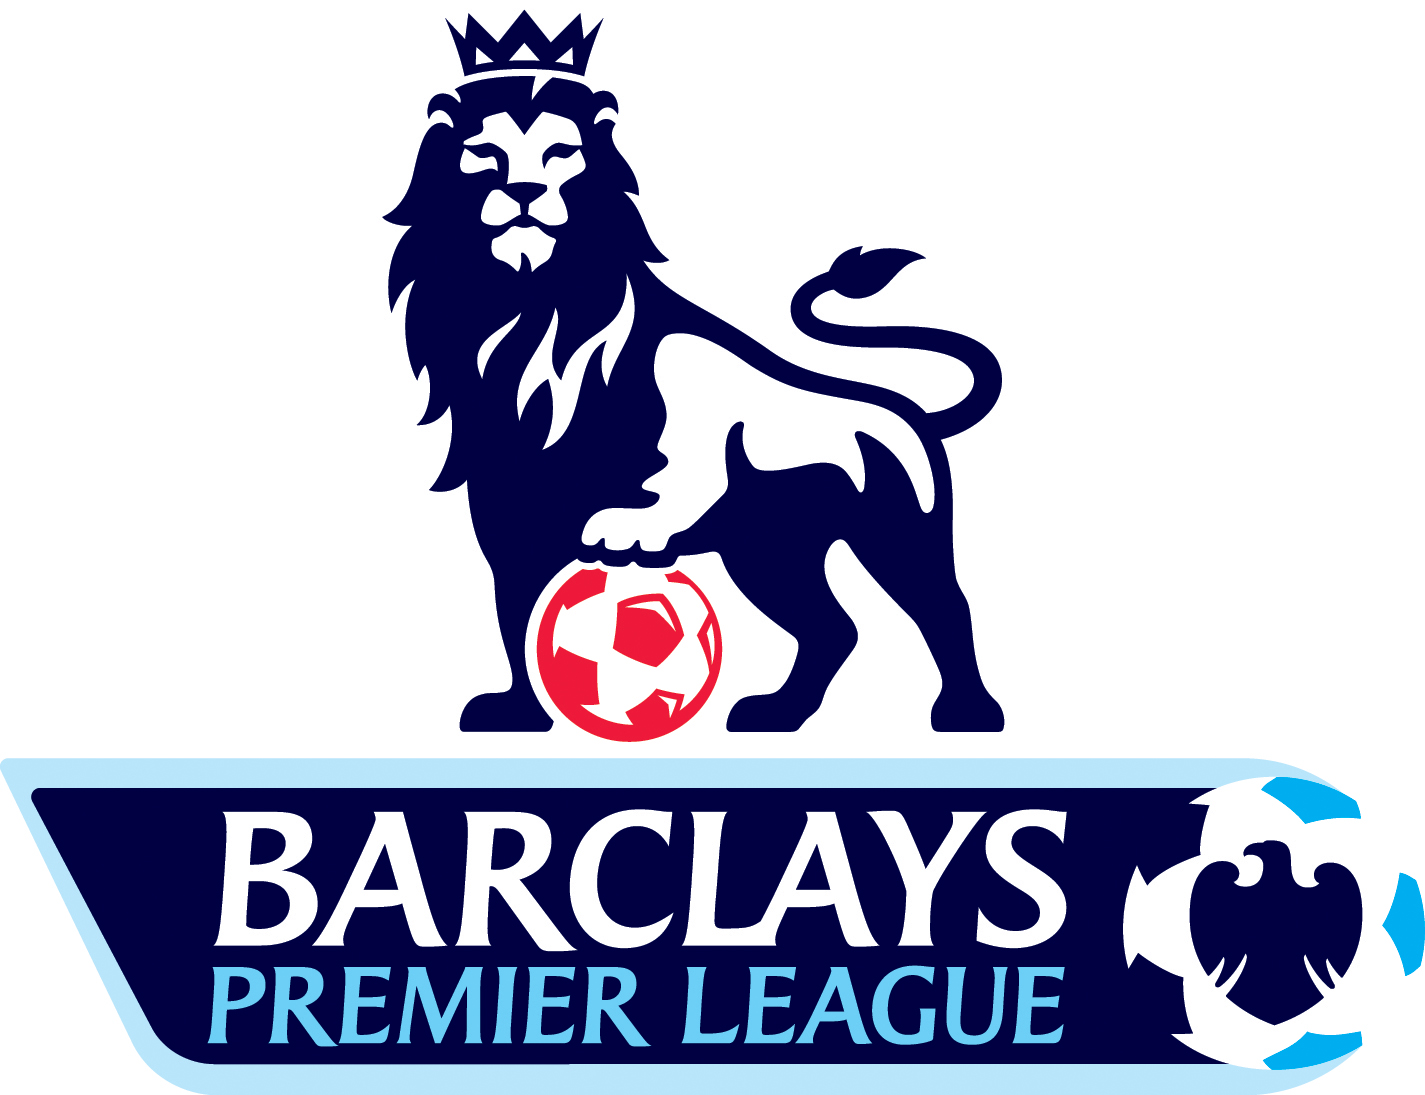 Chaine TV Arsenal Manchester United